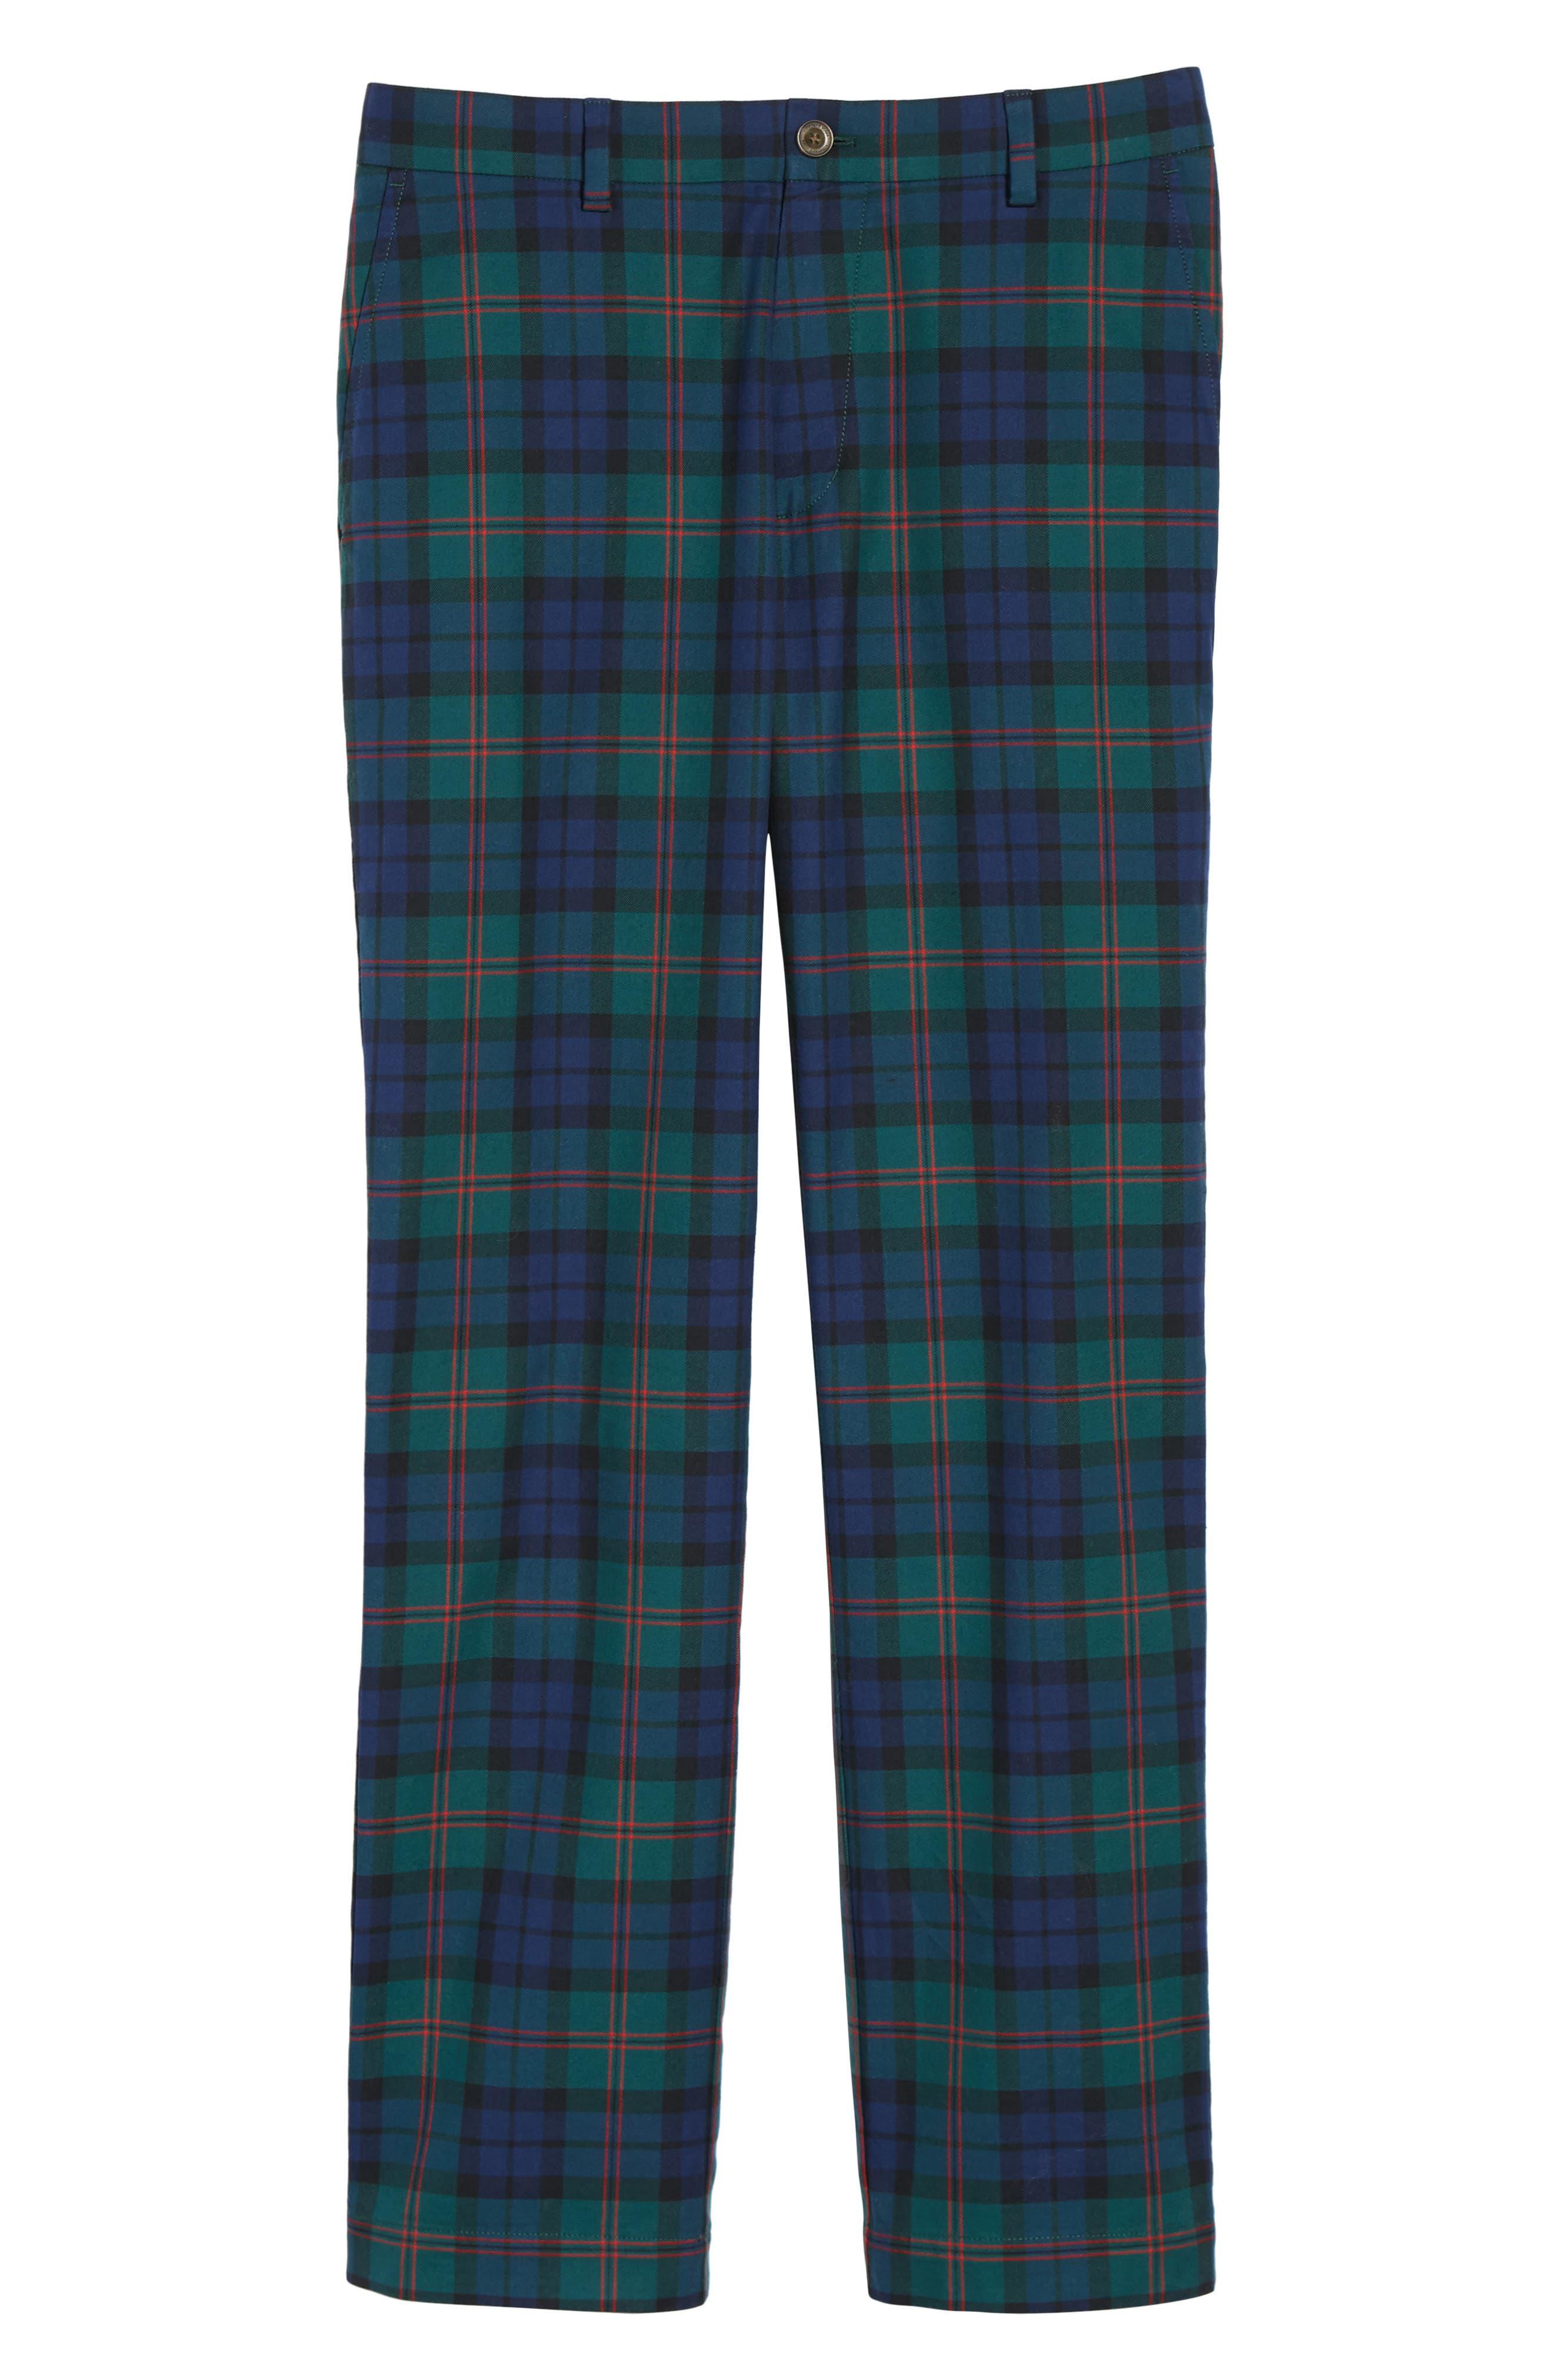 Breaker Holiday Tartan Pants,                             Alternate thumbnail 6, color,